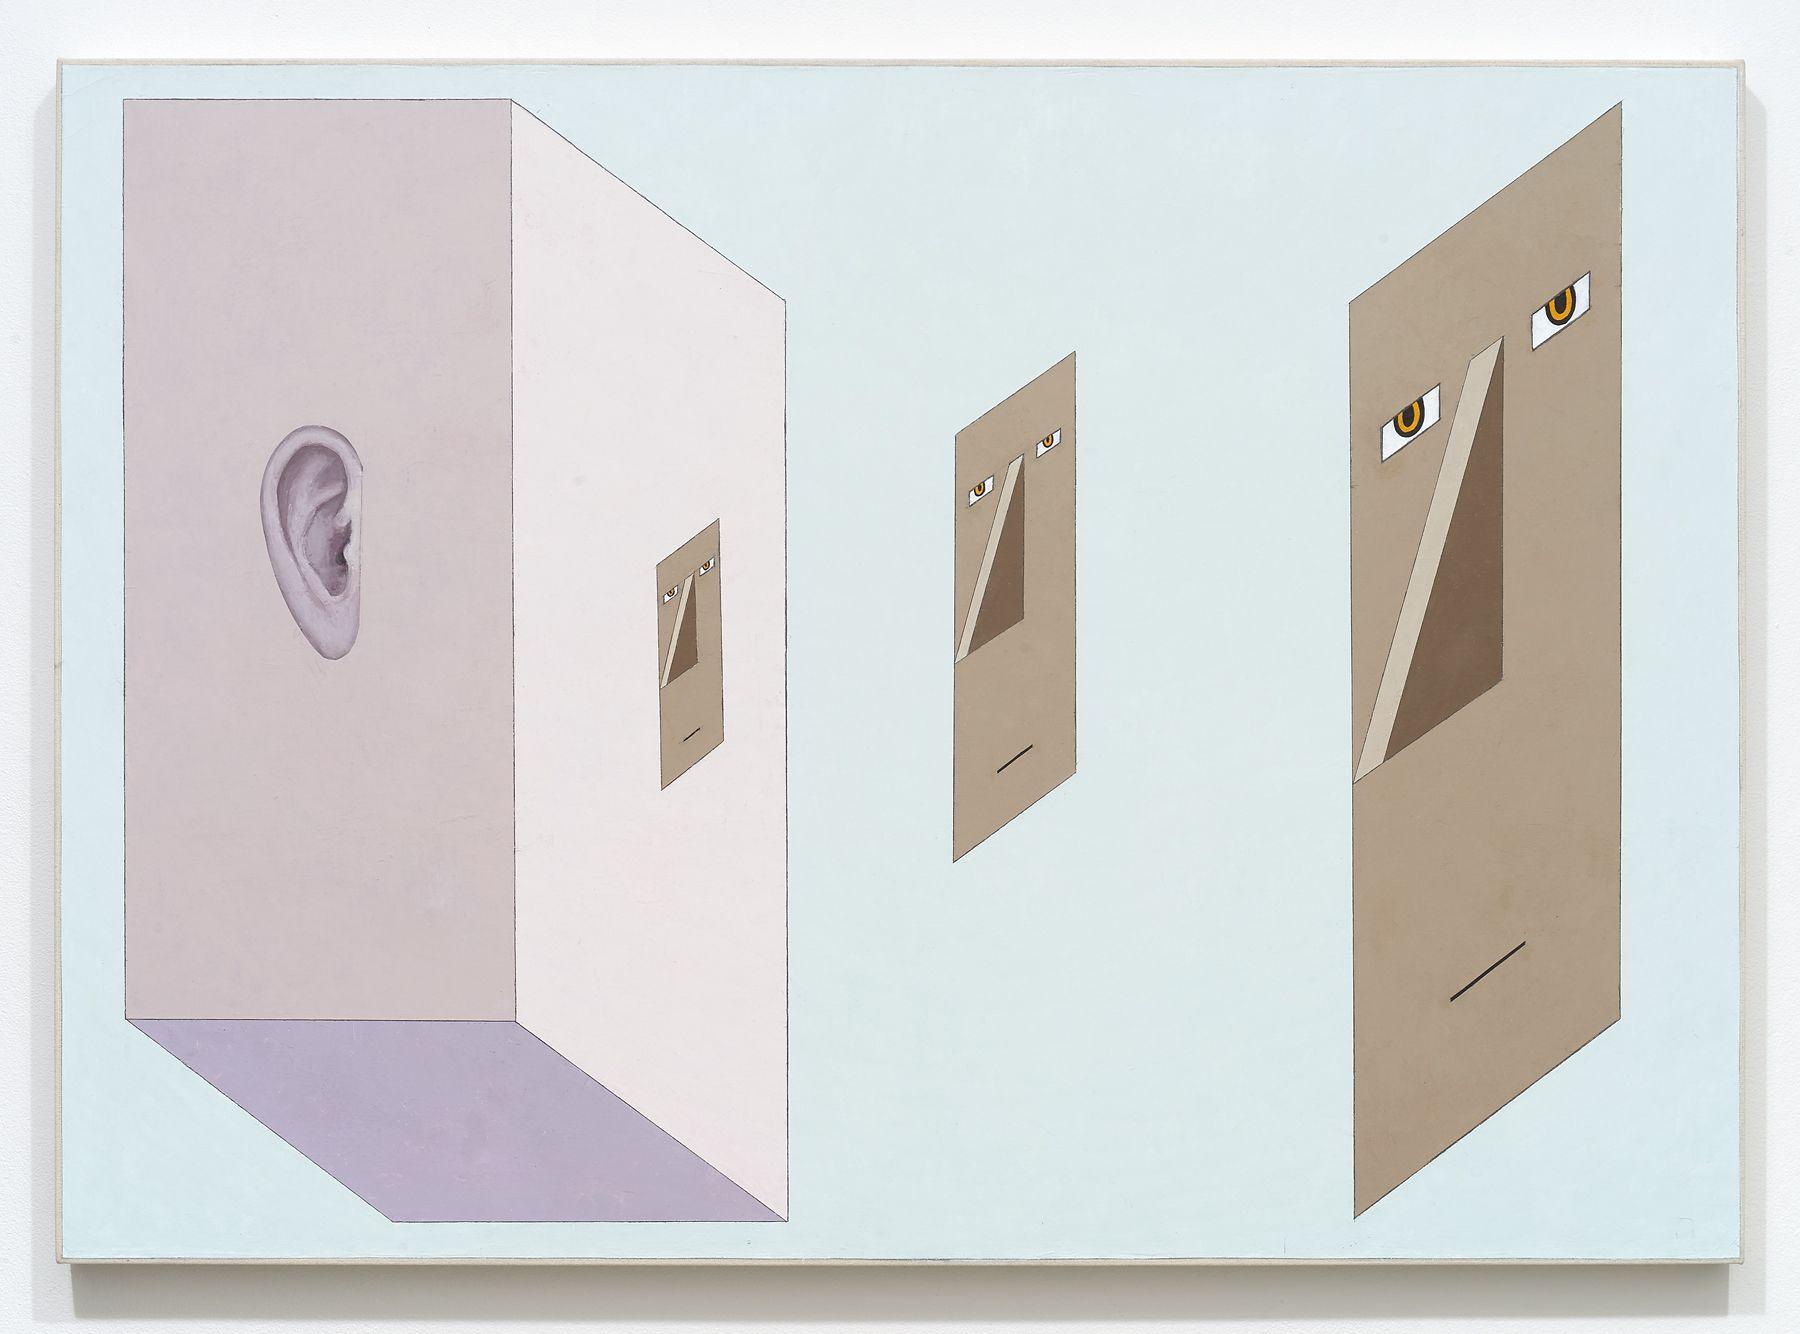 MERNET LARSEN, Conversation, 2012